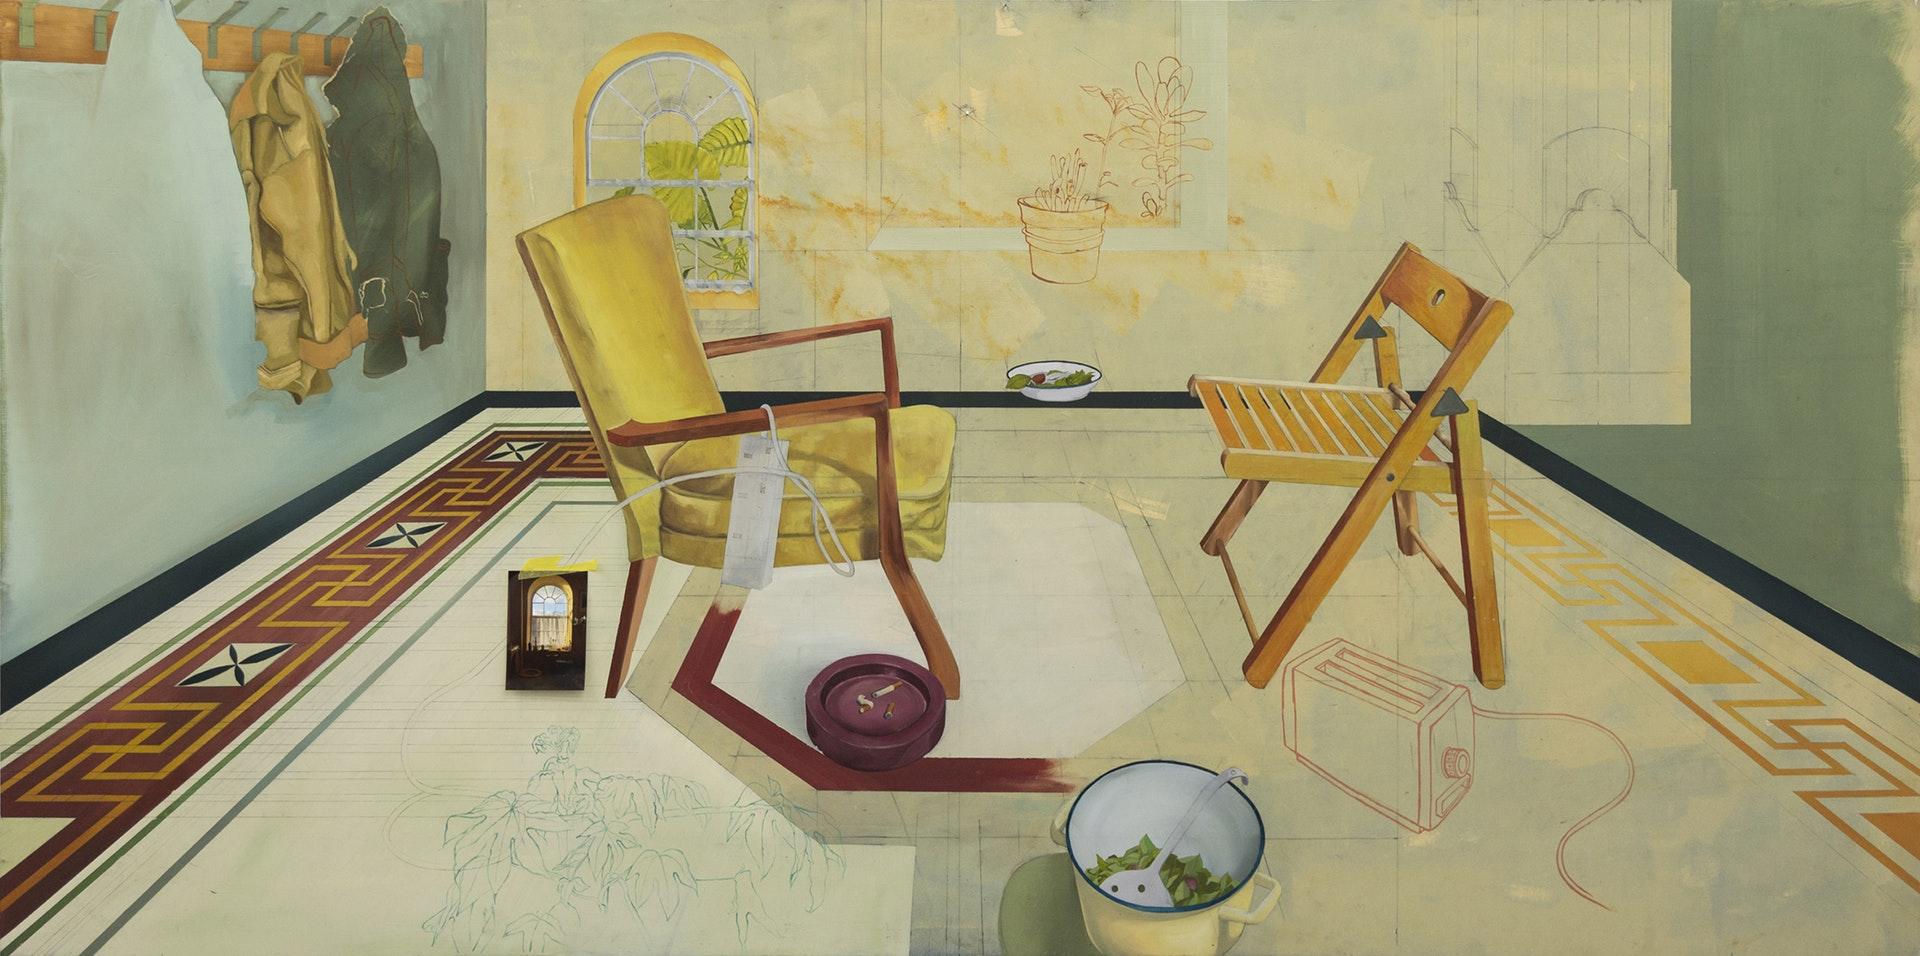 'Caravan I', Ruairi Fallon Mc Guigan, Oil Painting on Board, 1220 x 2440 x 1.8 cm